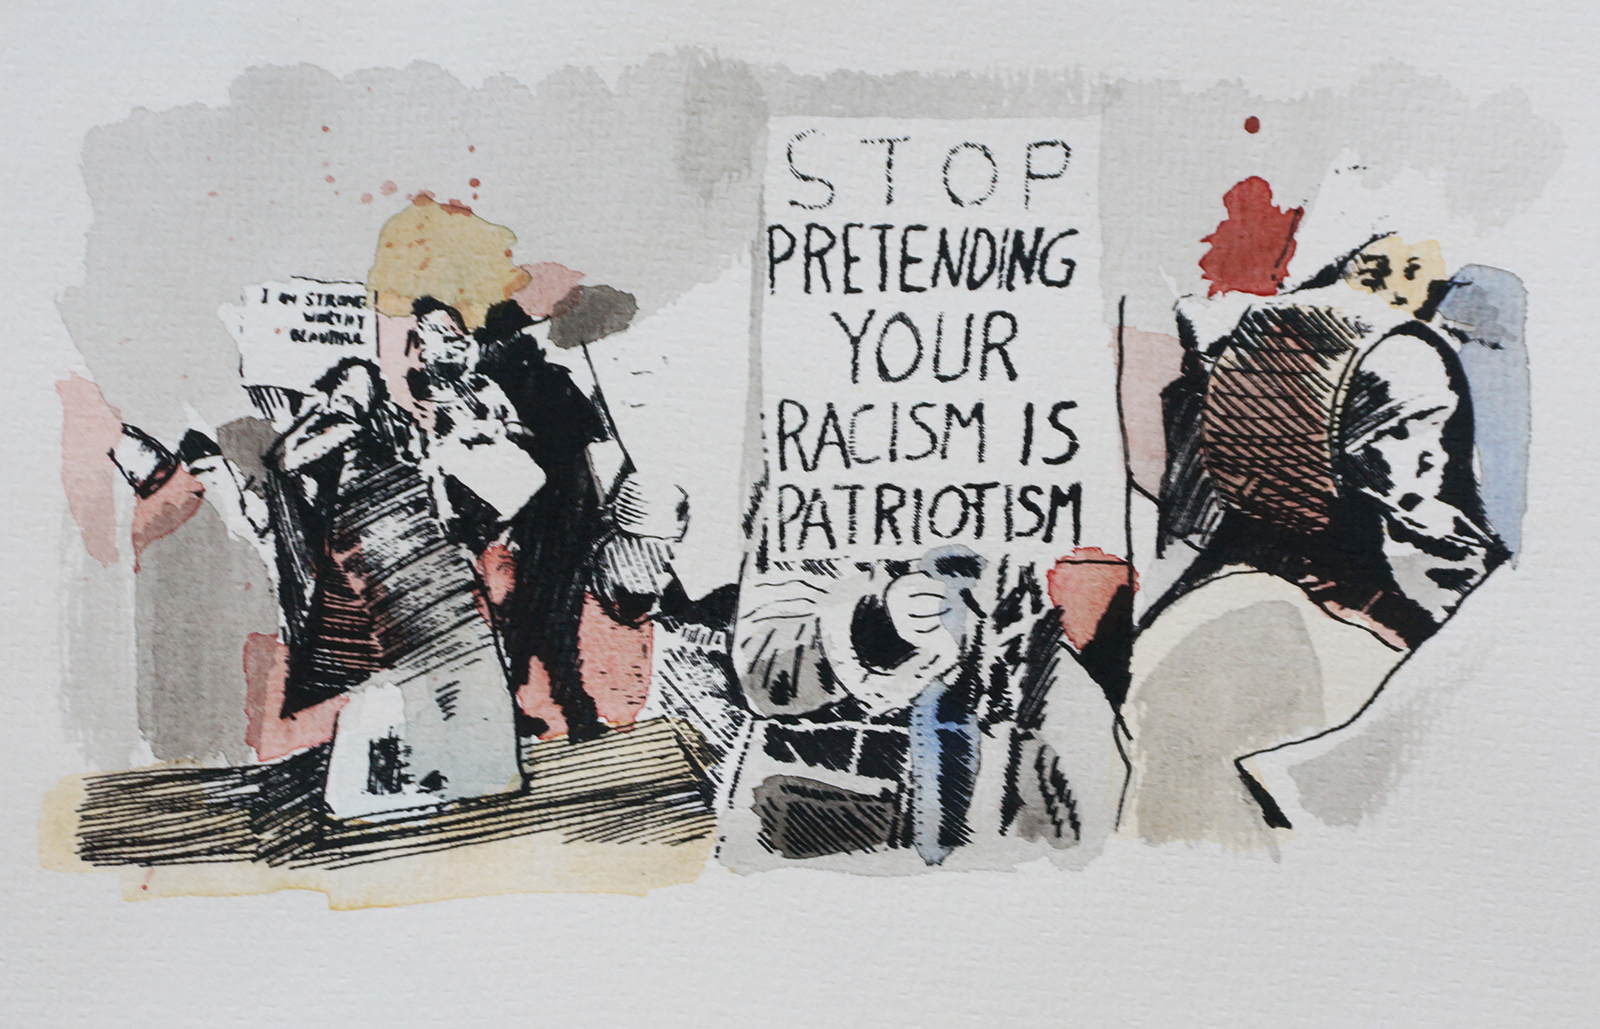 Ape_Bleakney_March Mixed Media - 'Stop Pretending (4)', 6.5''x9.5'', Screen Print + Watercolor, 2018 copy.jpg